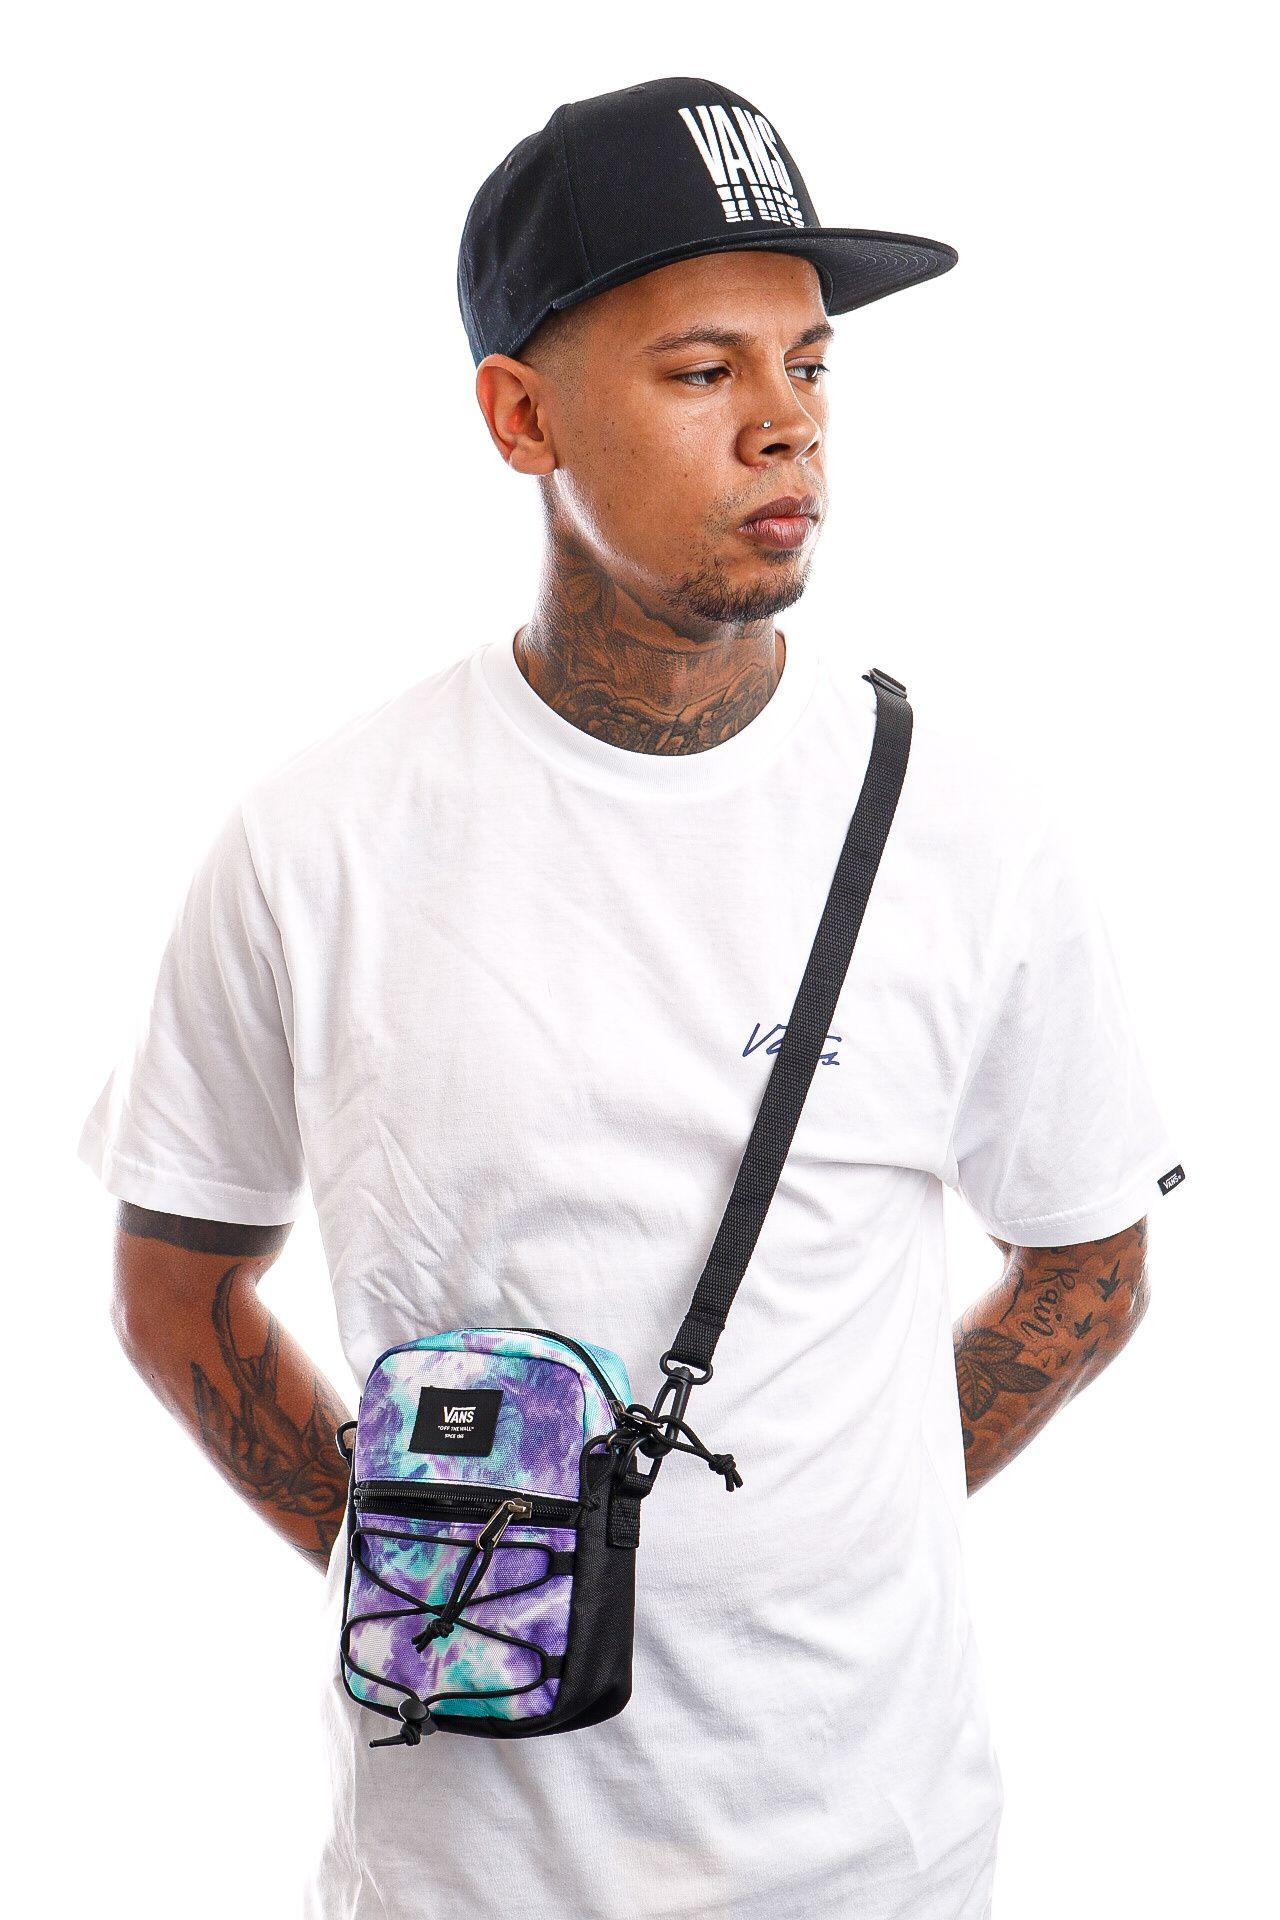 Afbeelding van Vans Schoudertas Bail Shoulder Bag English Lavender/Tie Dye VN0A3I5SZ6L1